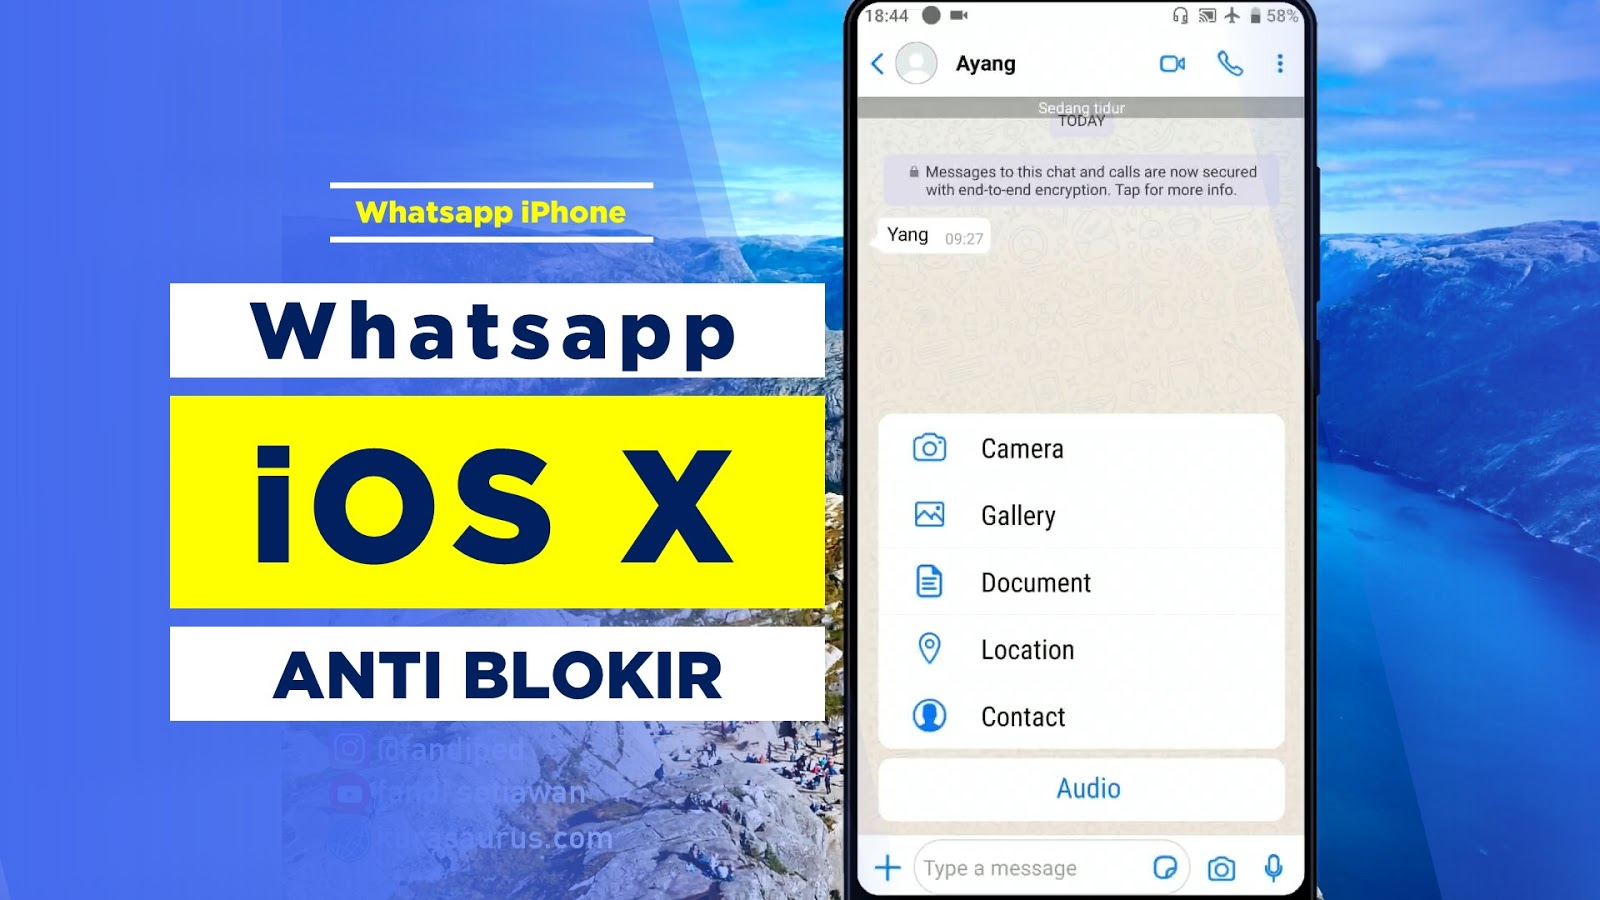 Whatsapp iOS / iPhone Anti Blokir TERBARU !!! GB iOS X V8 ...